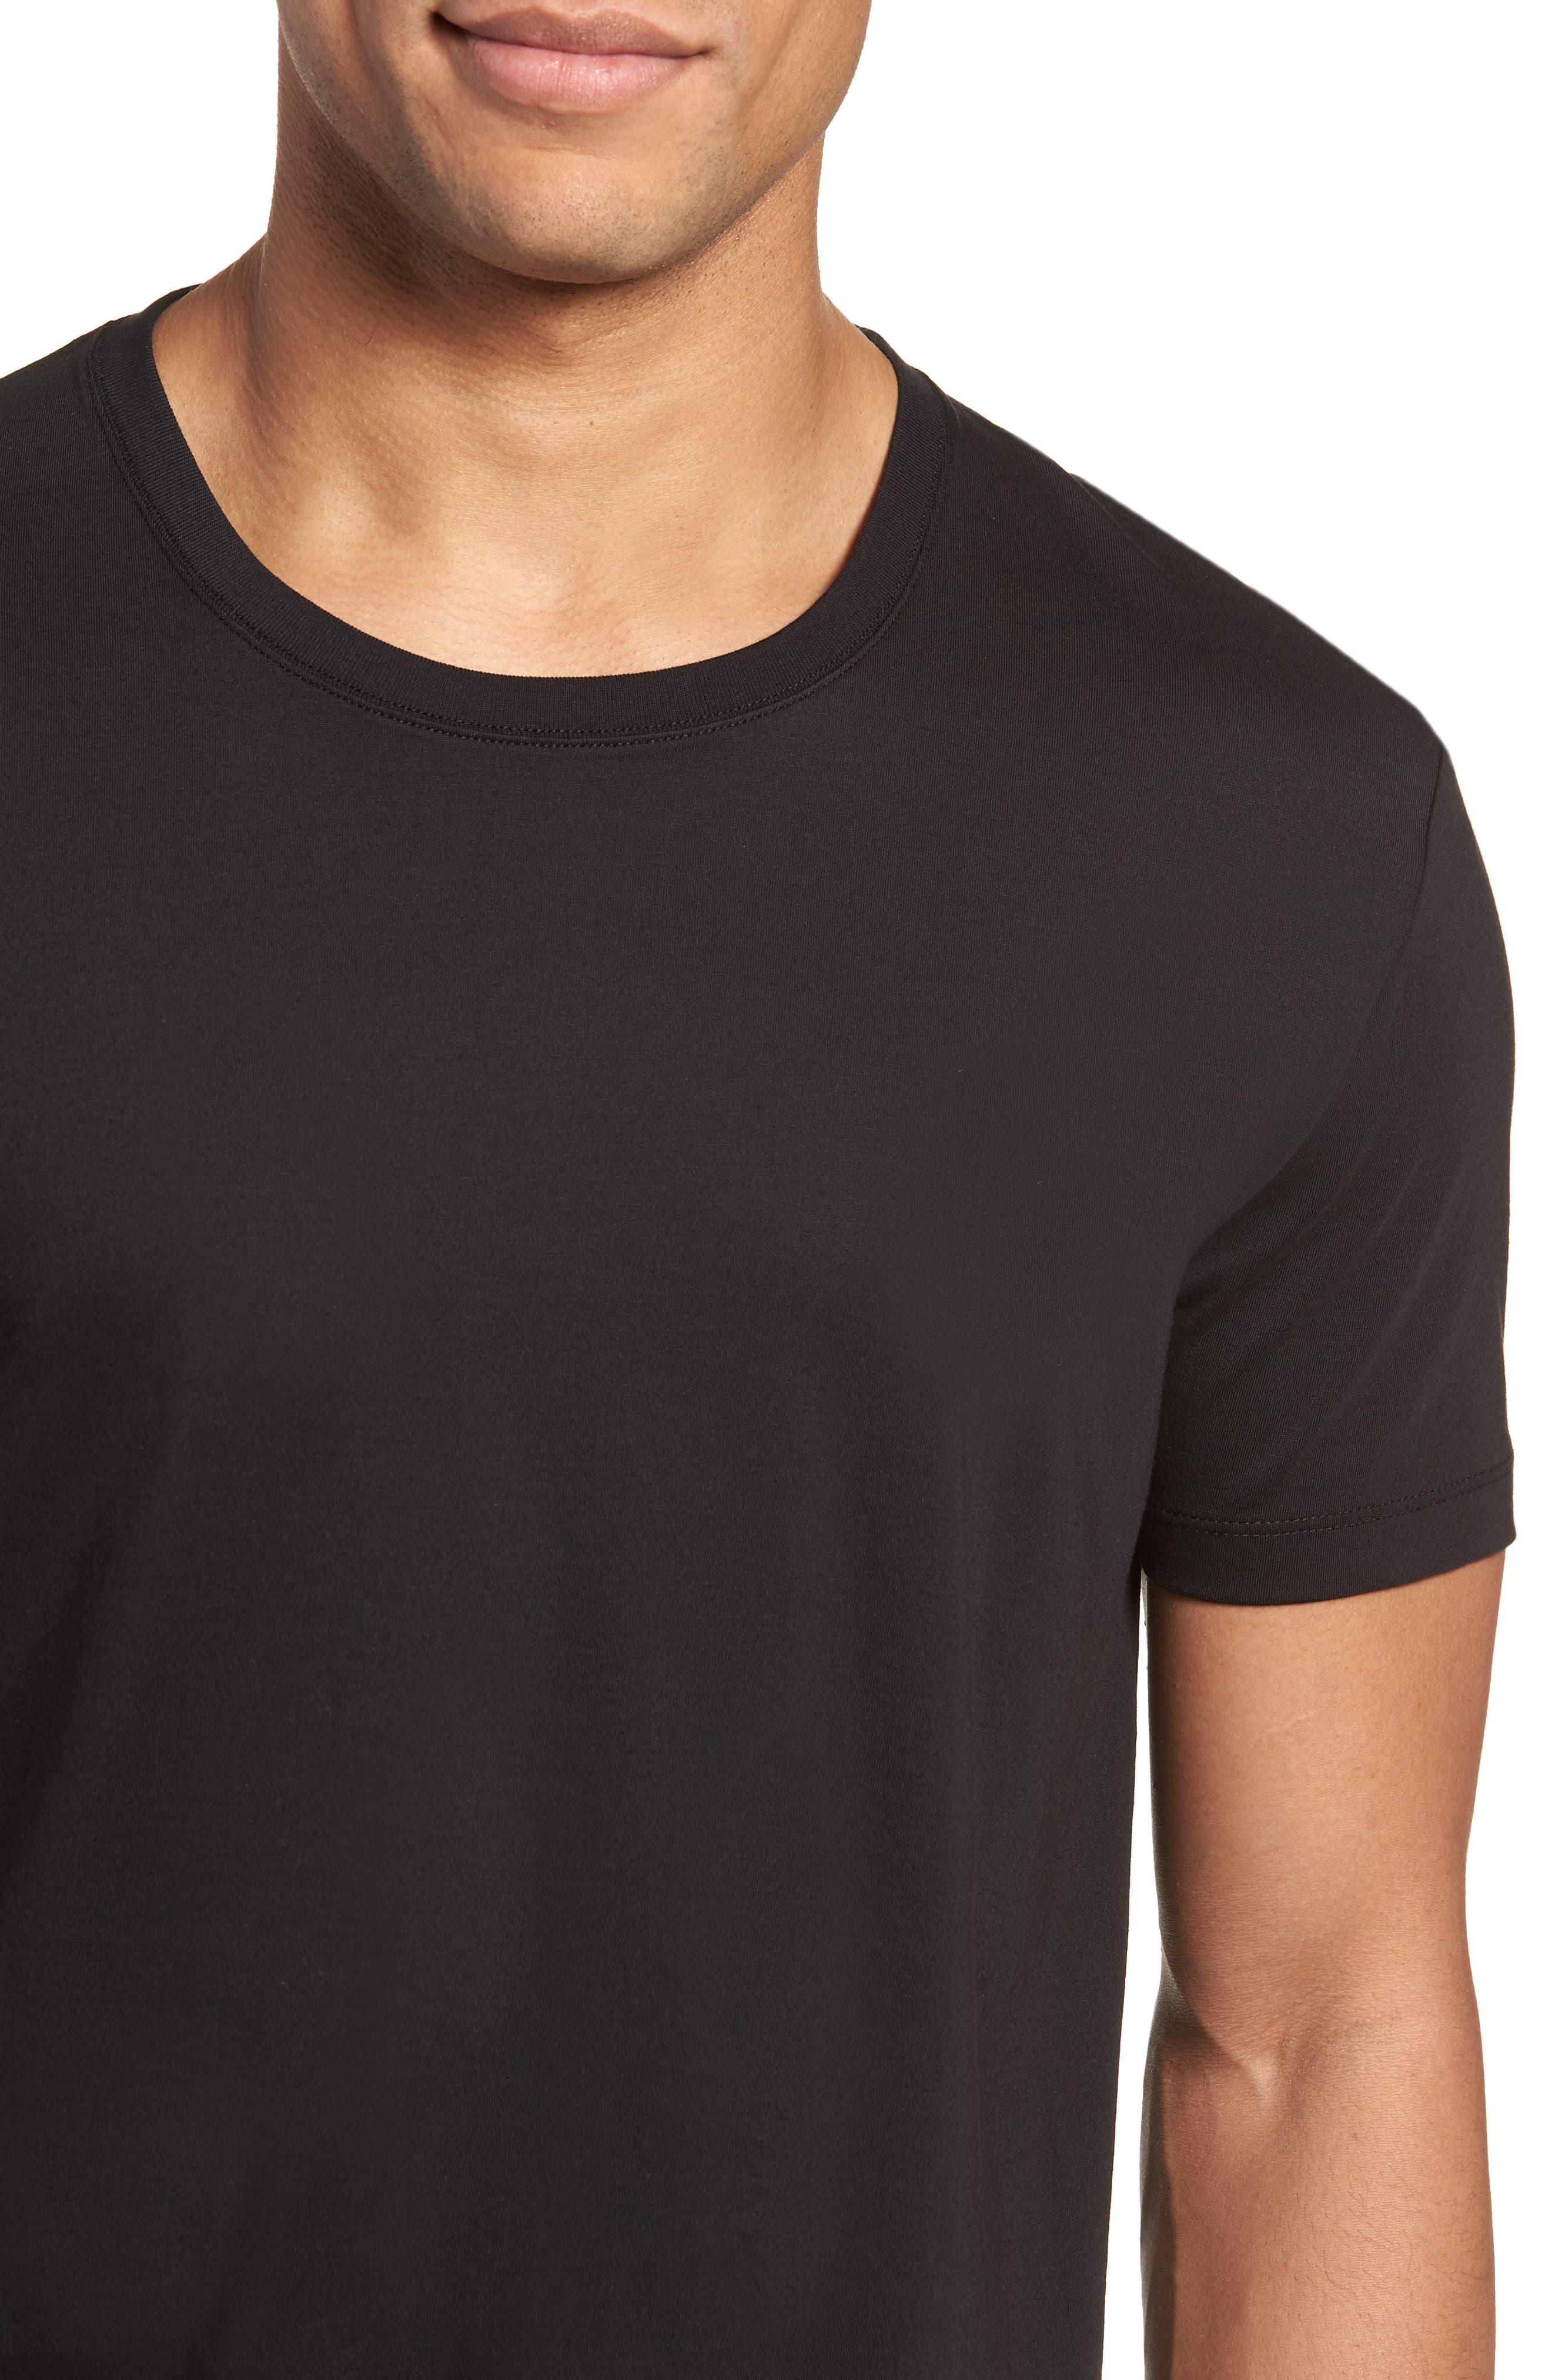 Tiburt Regular Fit Crewneck T-Shirt,                             Alternate thumbnail 4, color,                             001